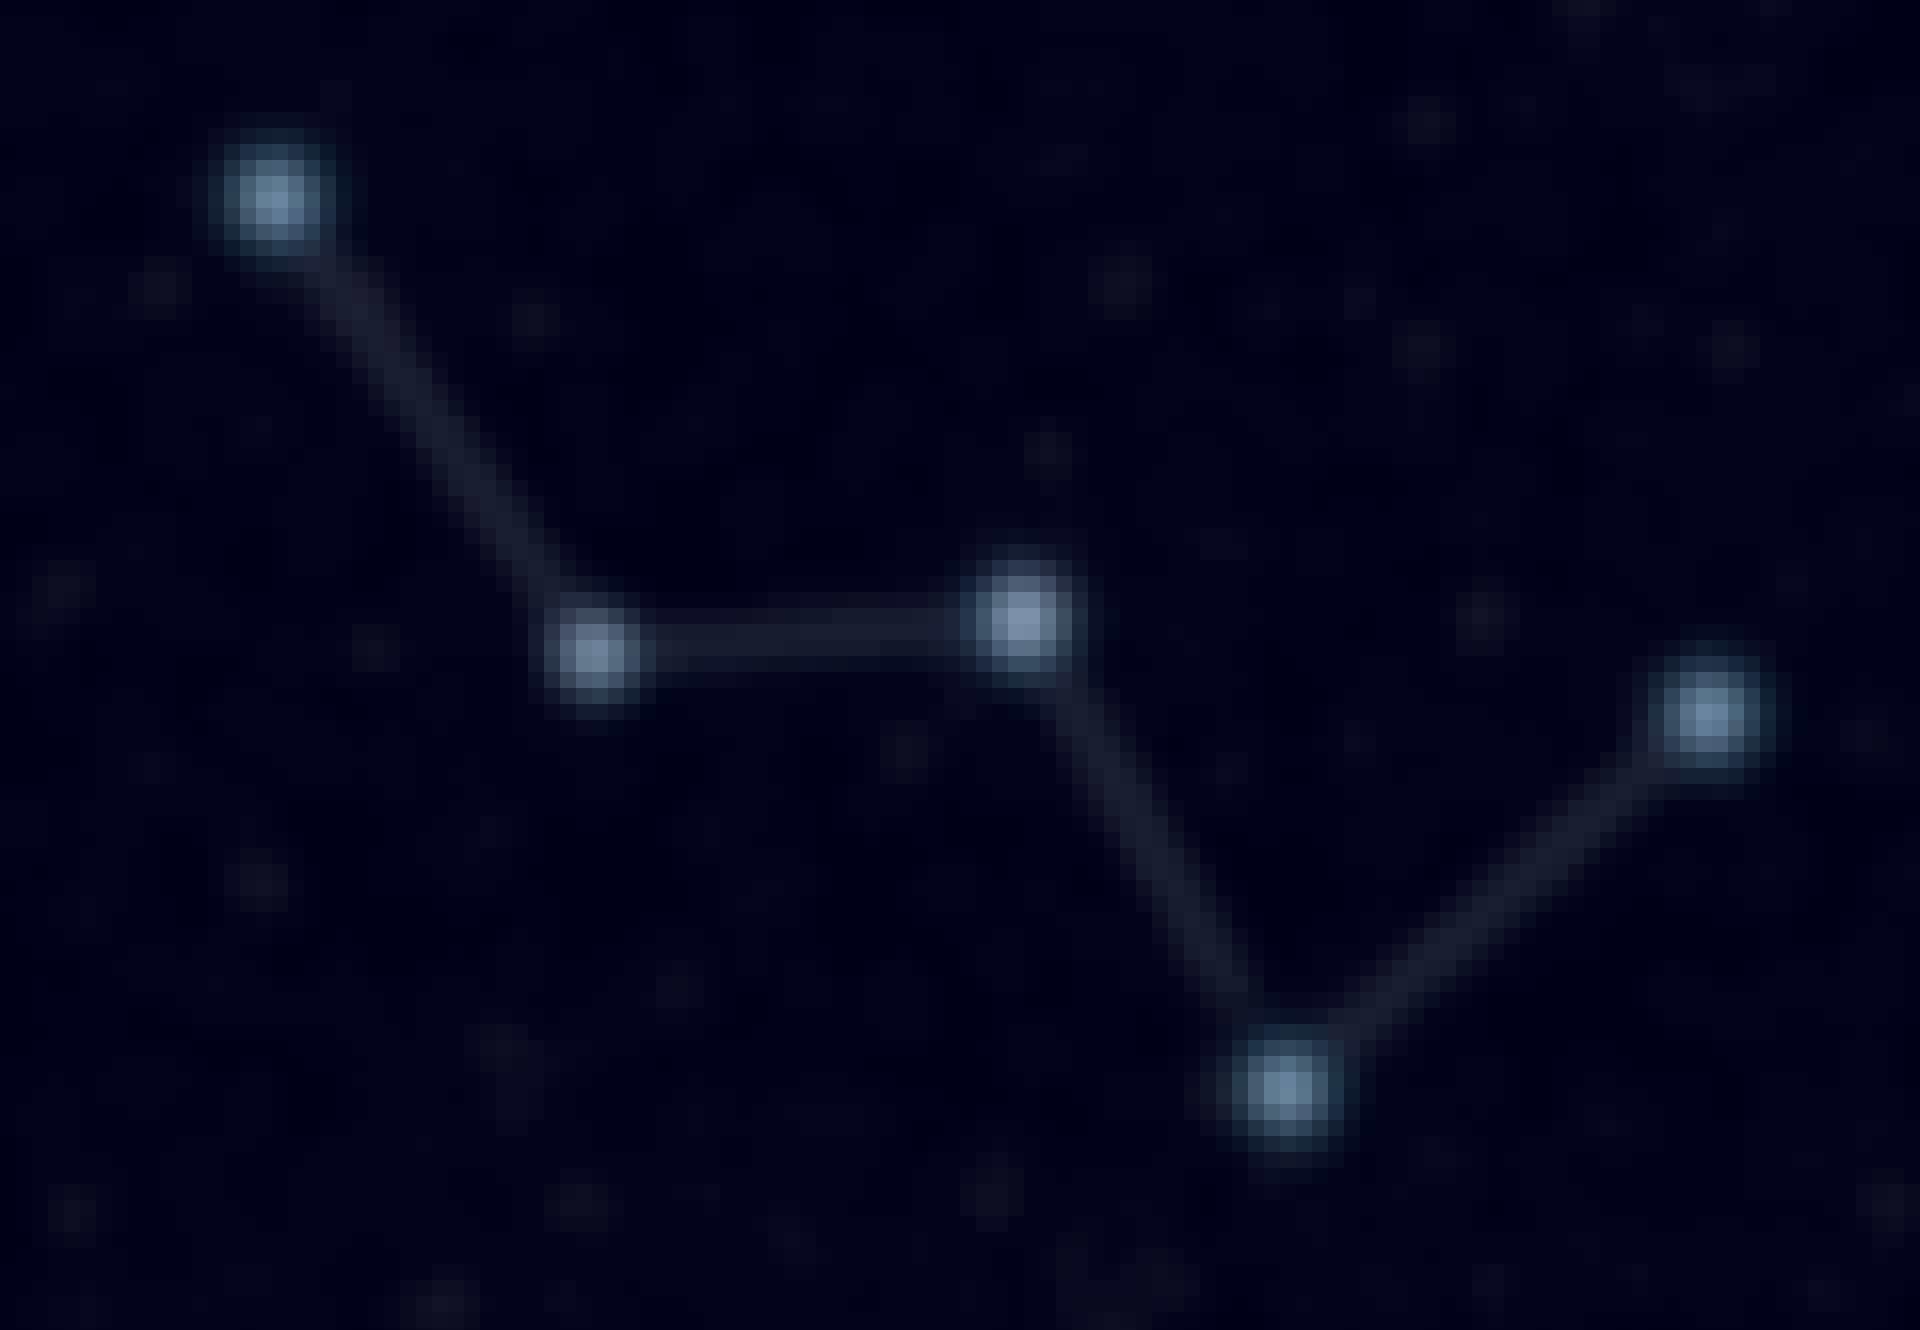 Stjernebilledet Cassiopeia